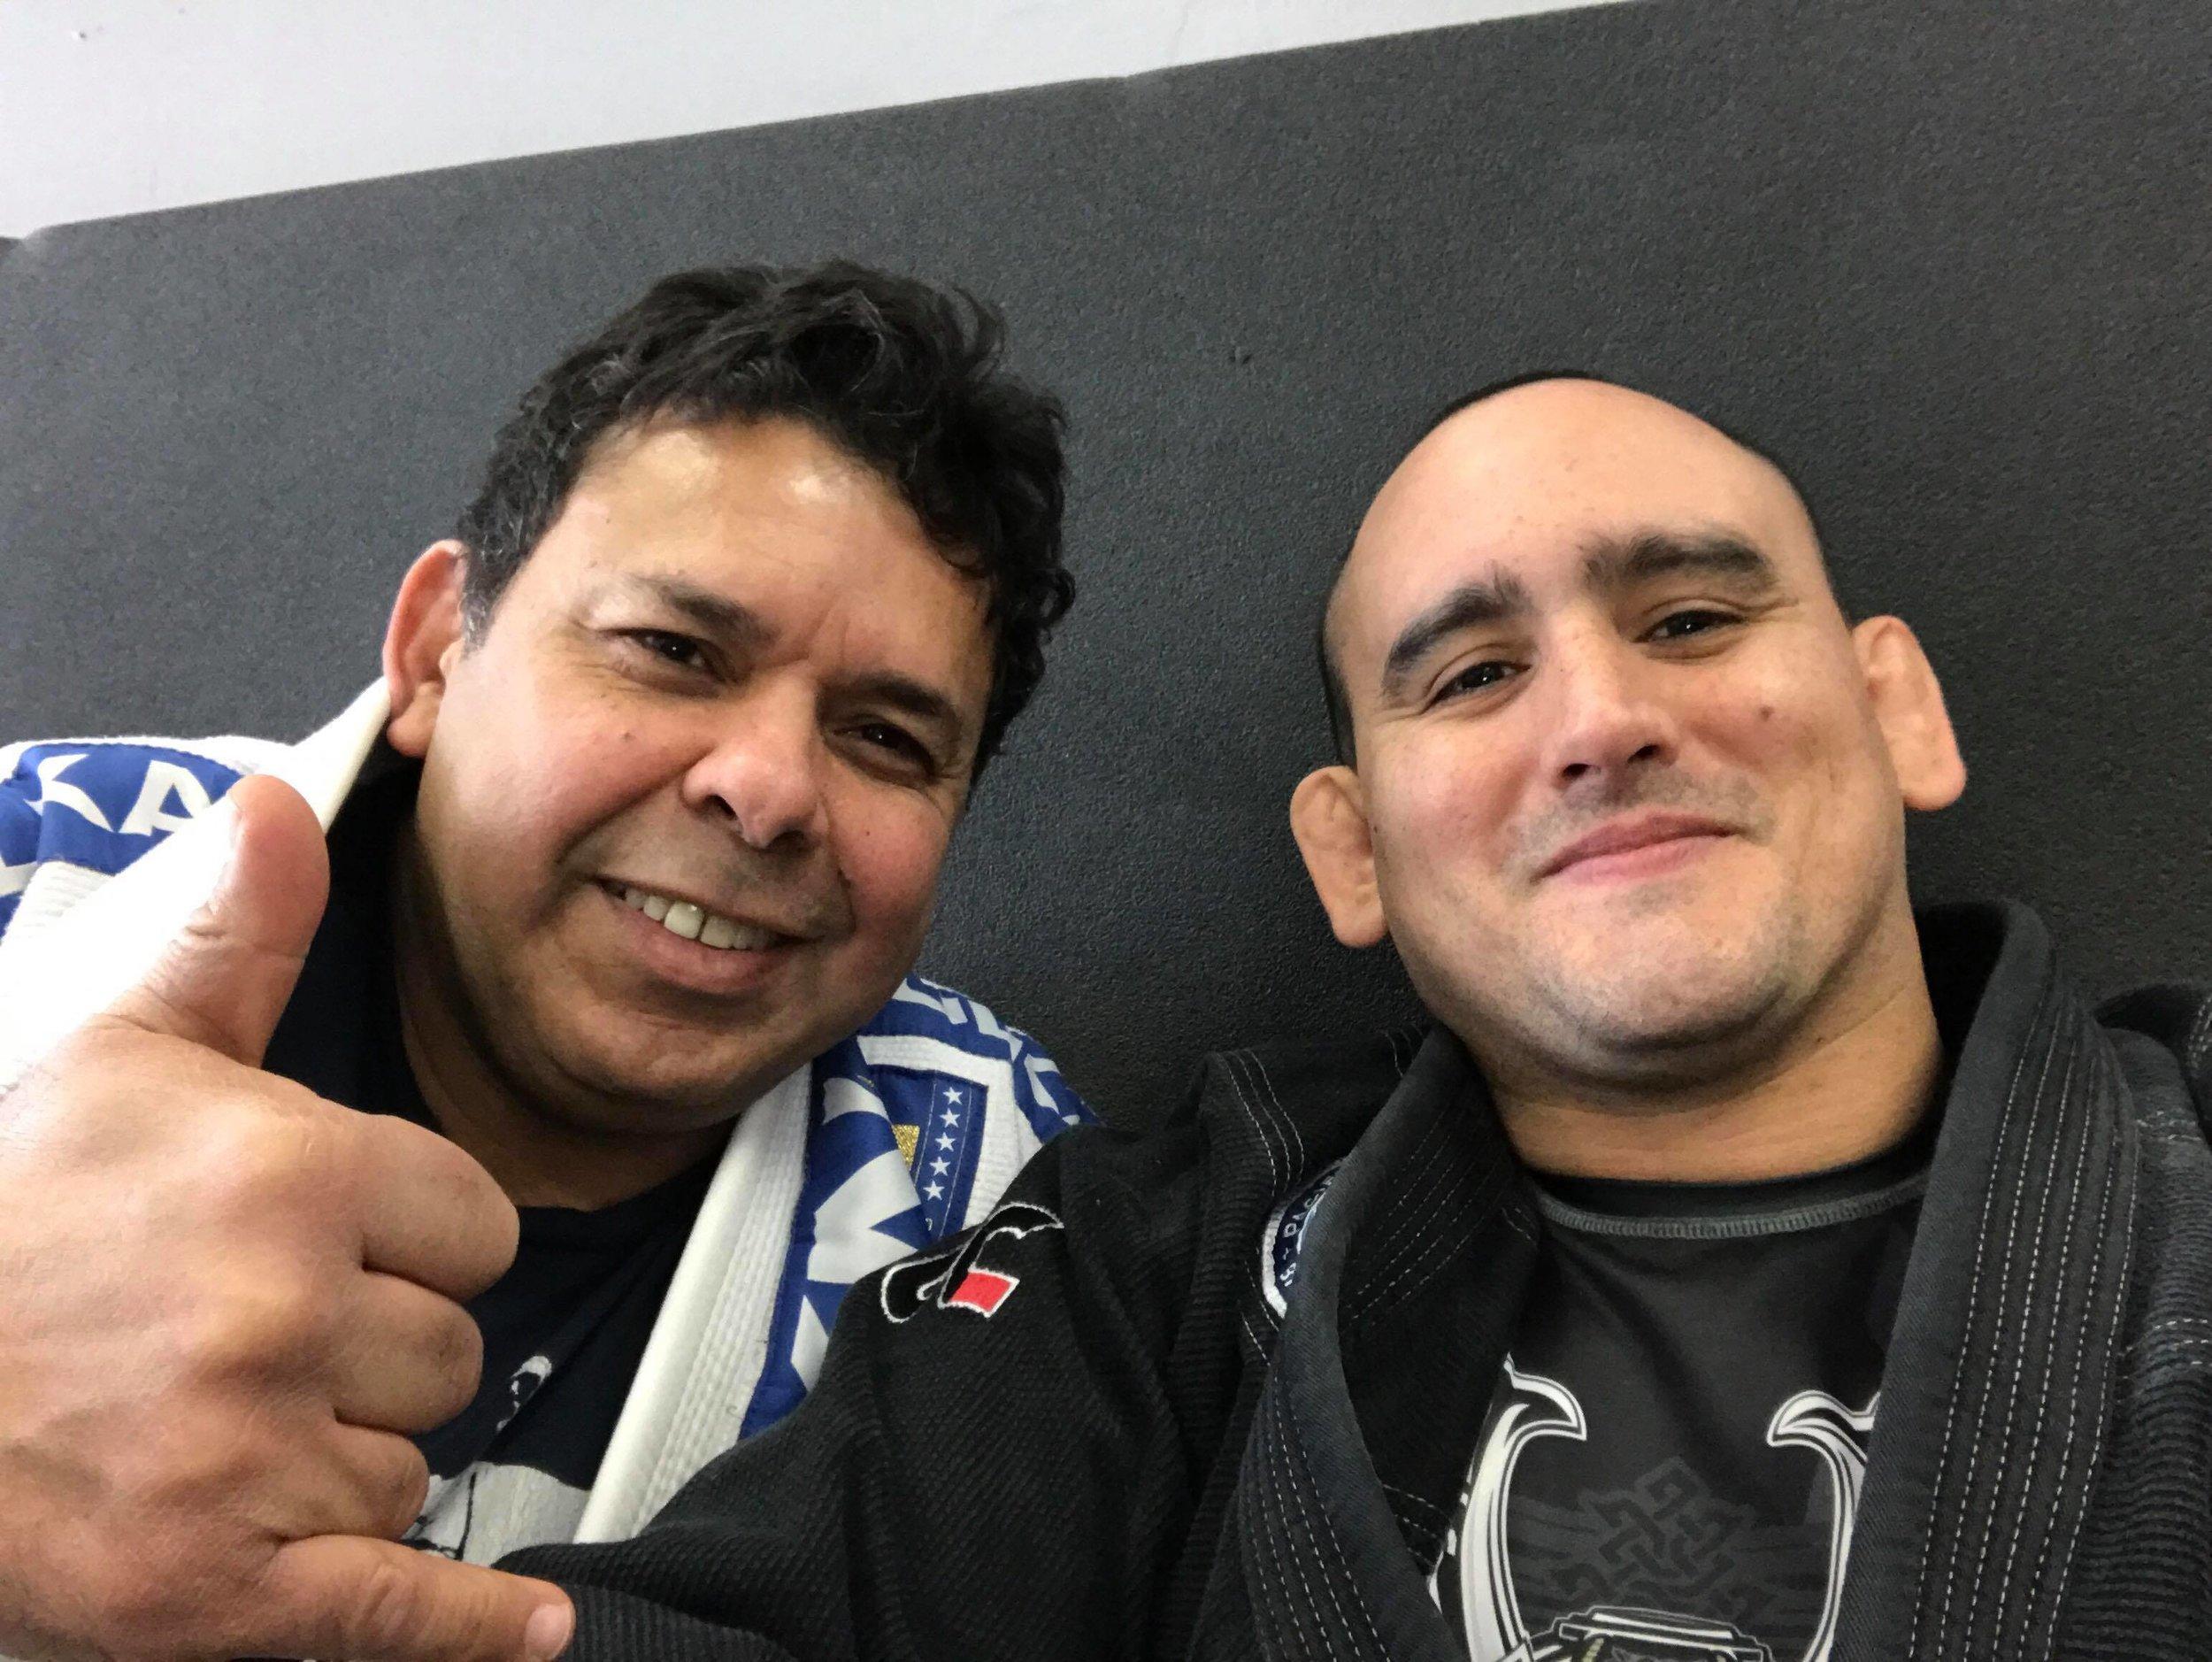 Master Joe Moreira and Juan Pablo Garcia